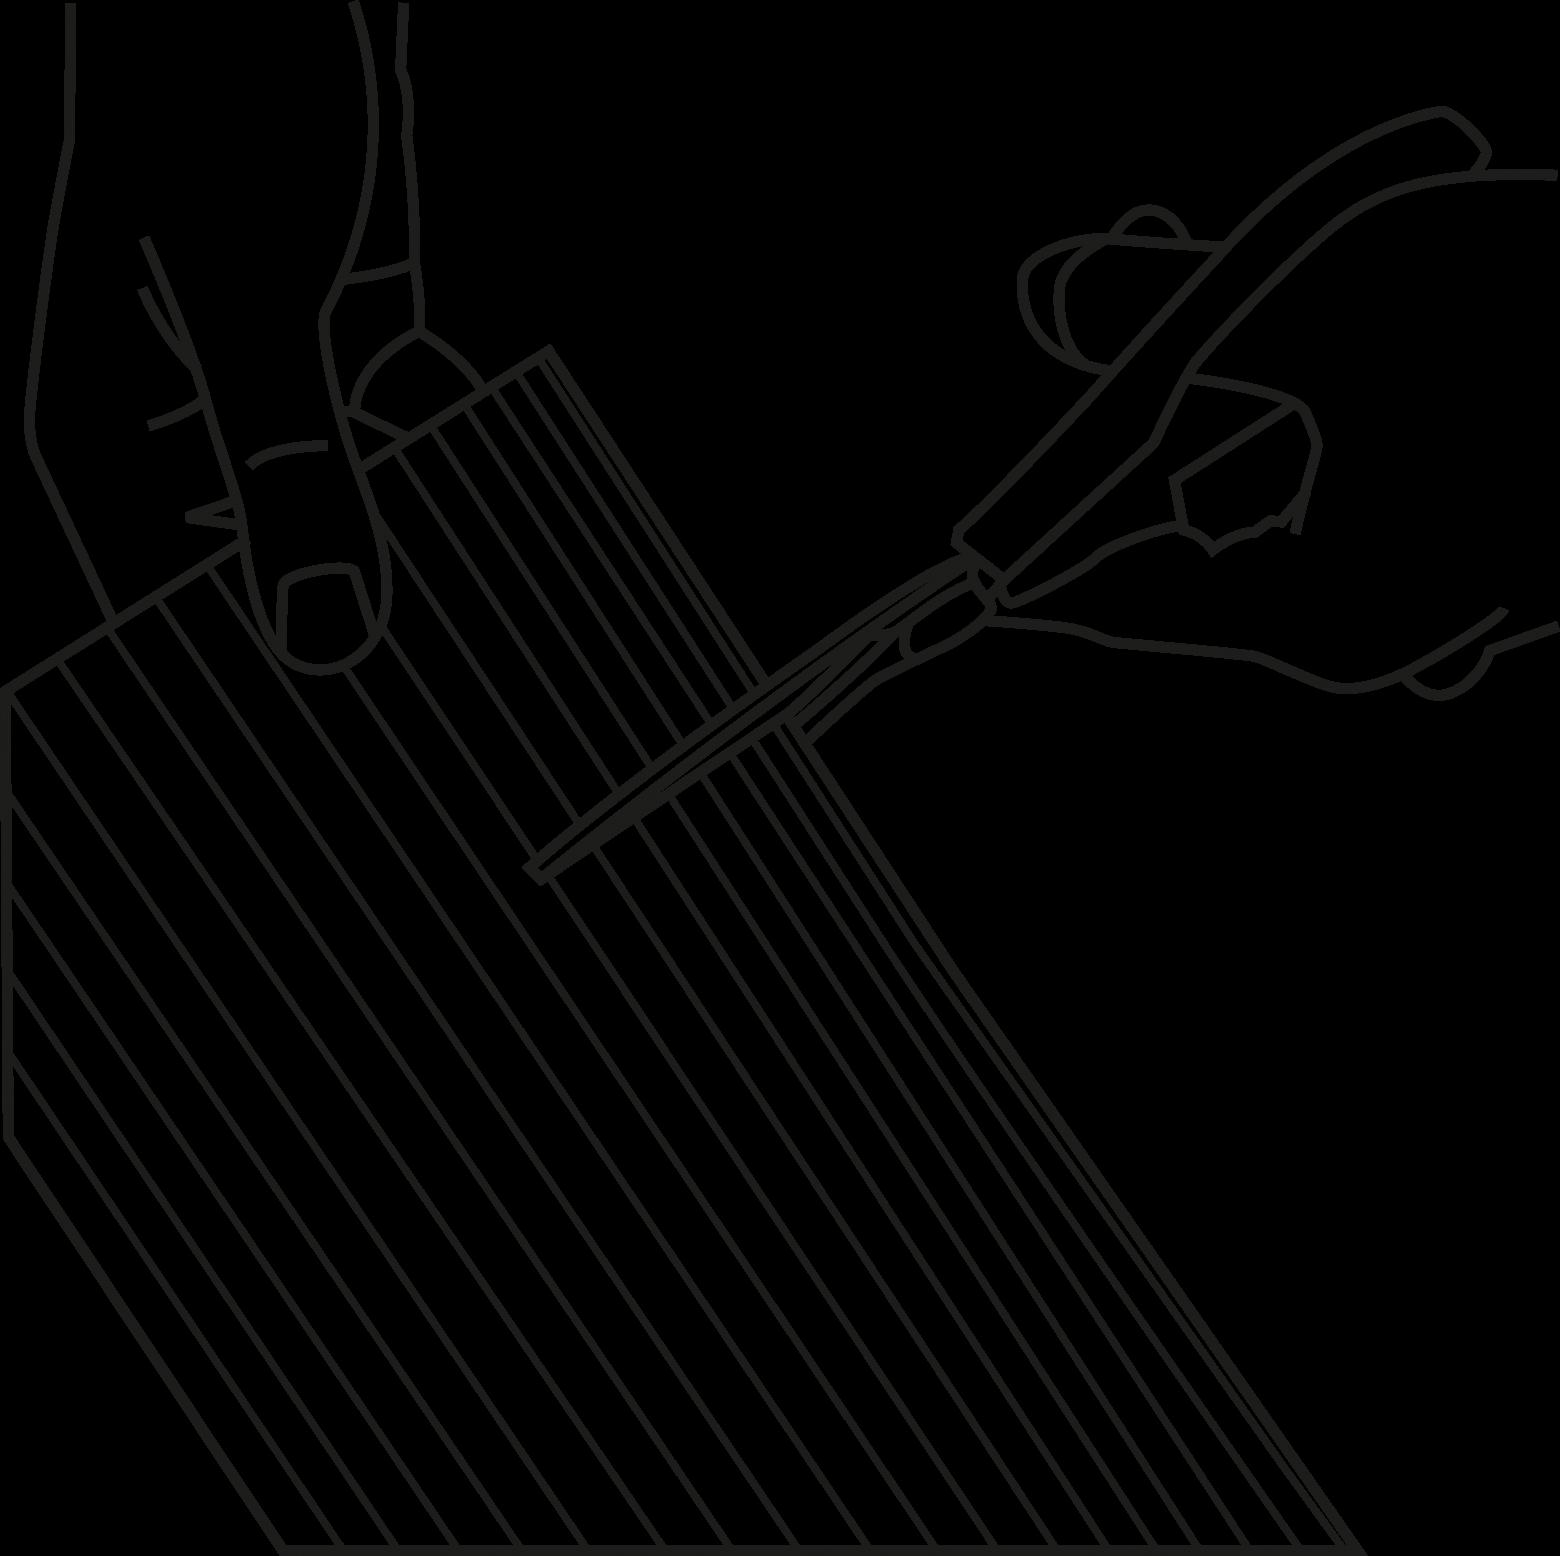 SERPA B9 BL: Kabelkanal, inkl. 2 Endkappen, 1,5 m, blau bei ...